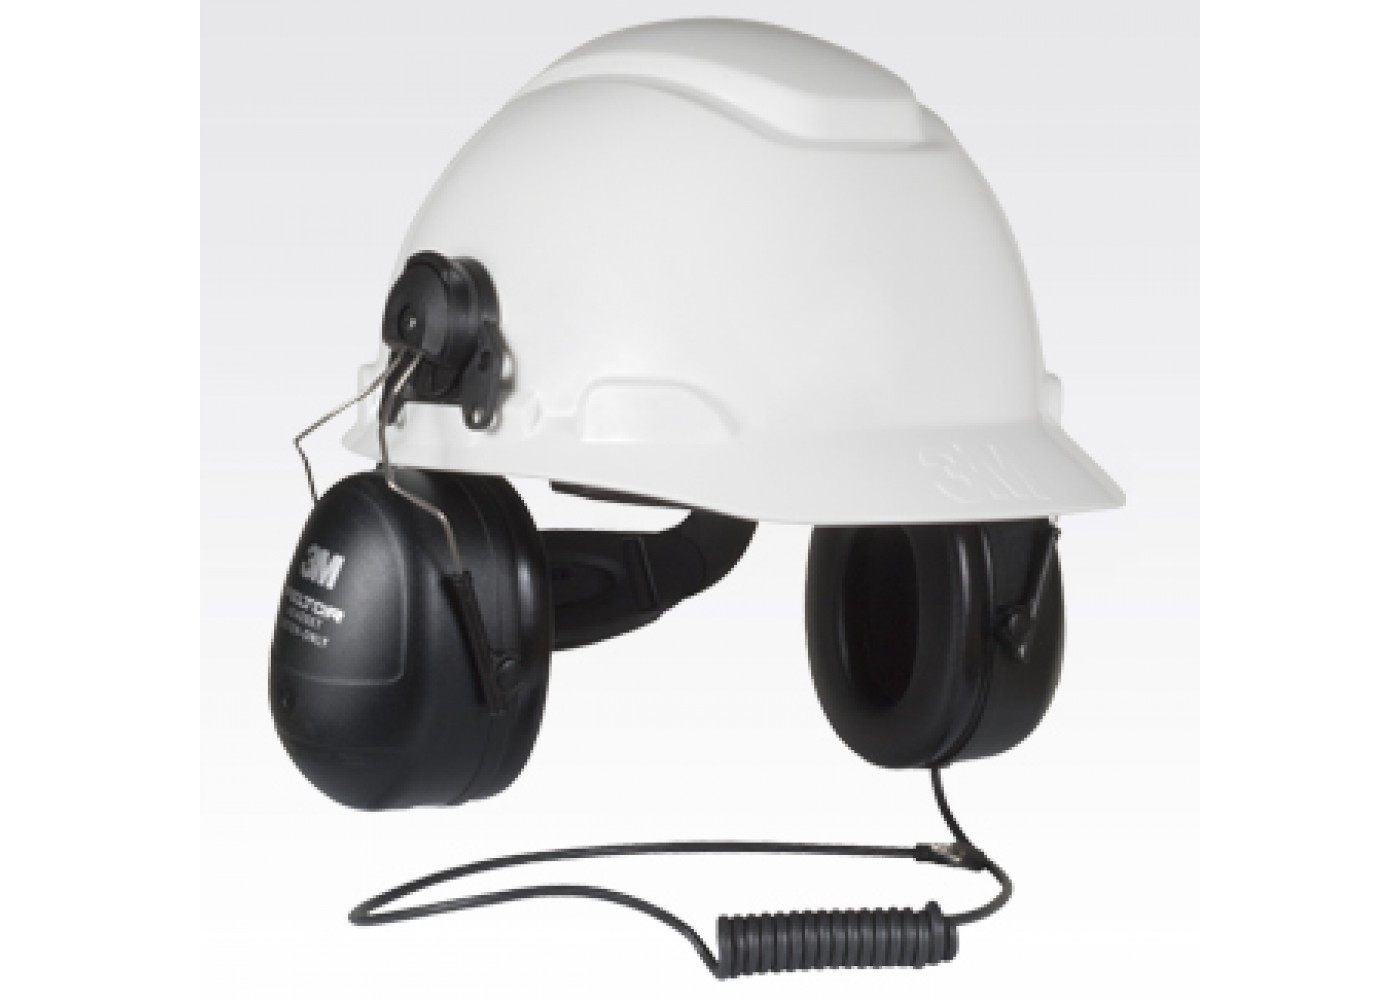 Peltor Headset Wiring Diagram Best Secret Kenwood Radio Headphone With Mic Aircraft